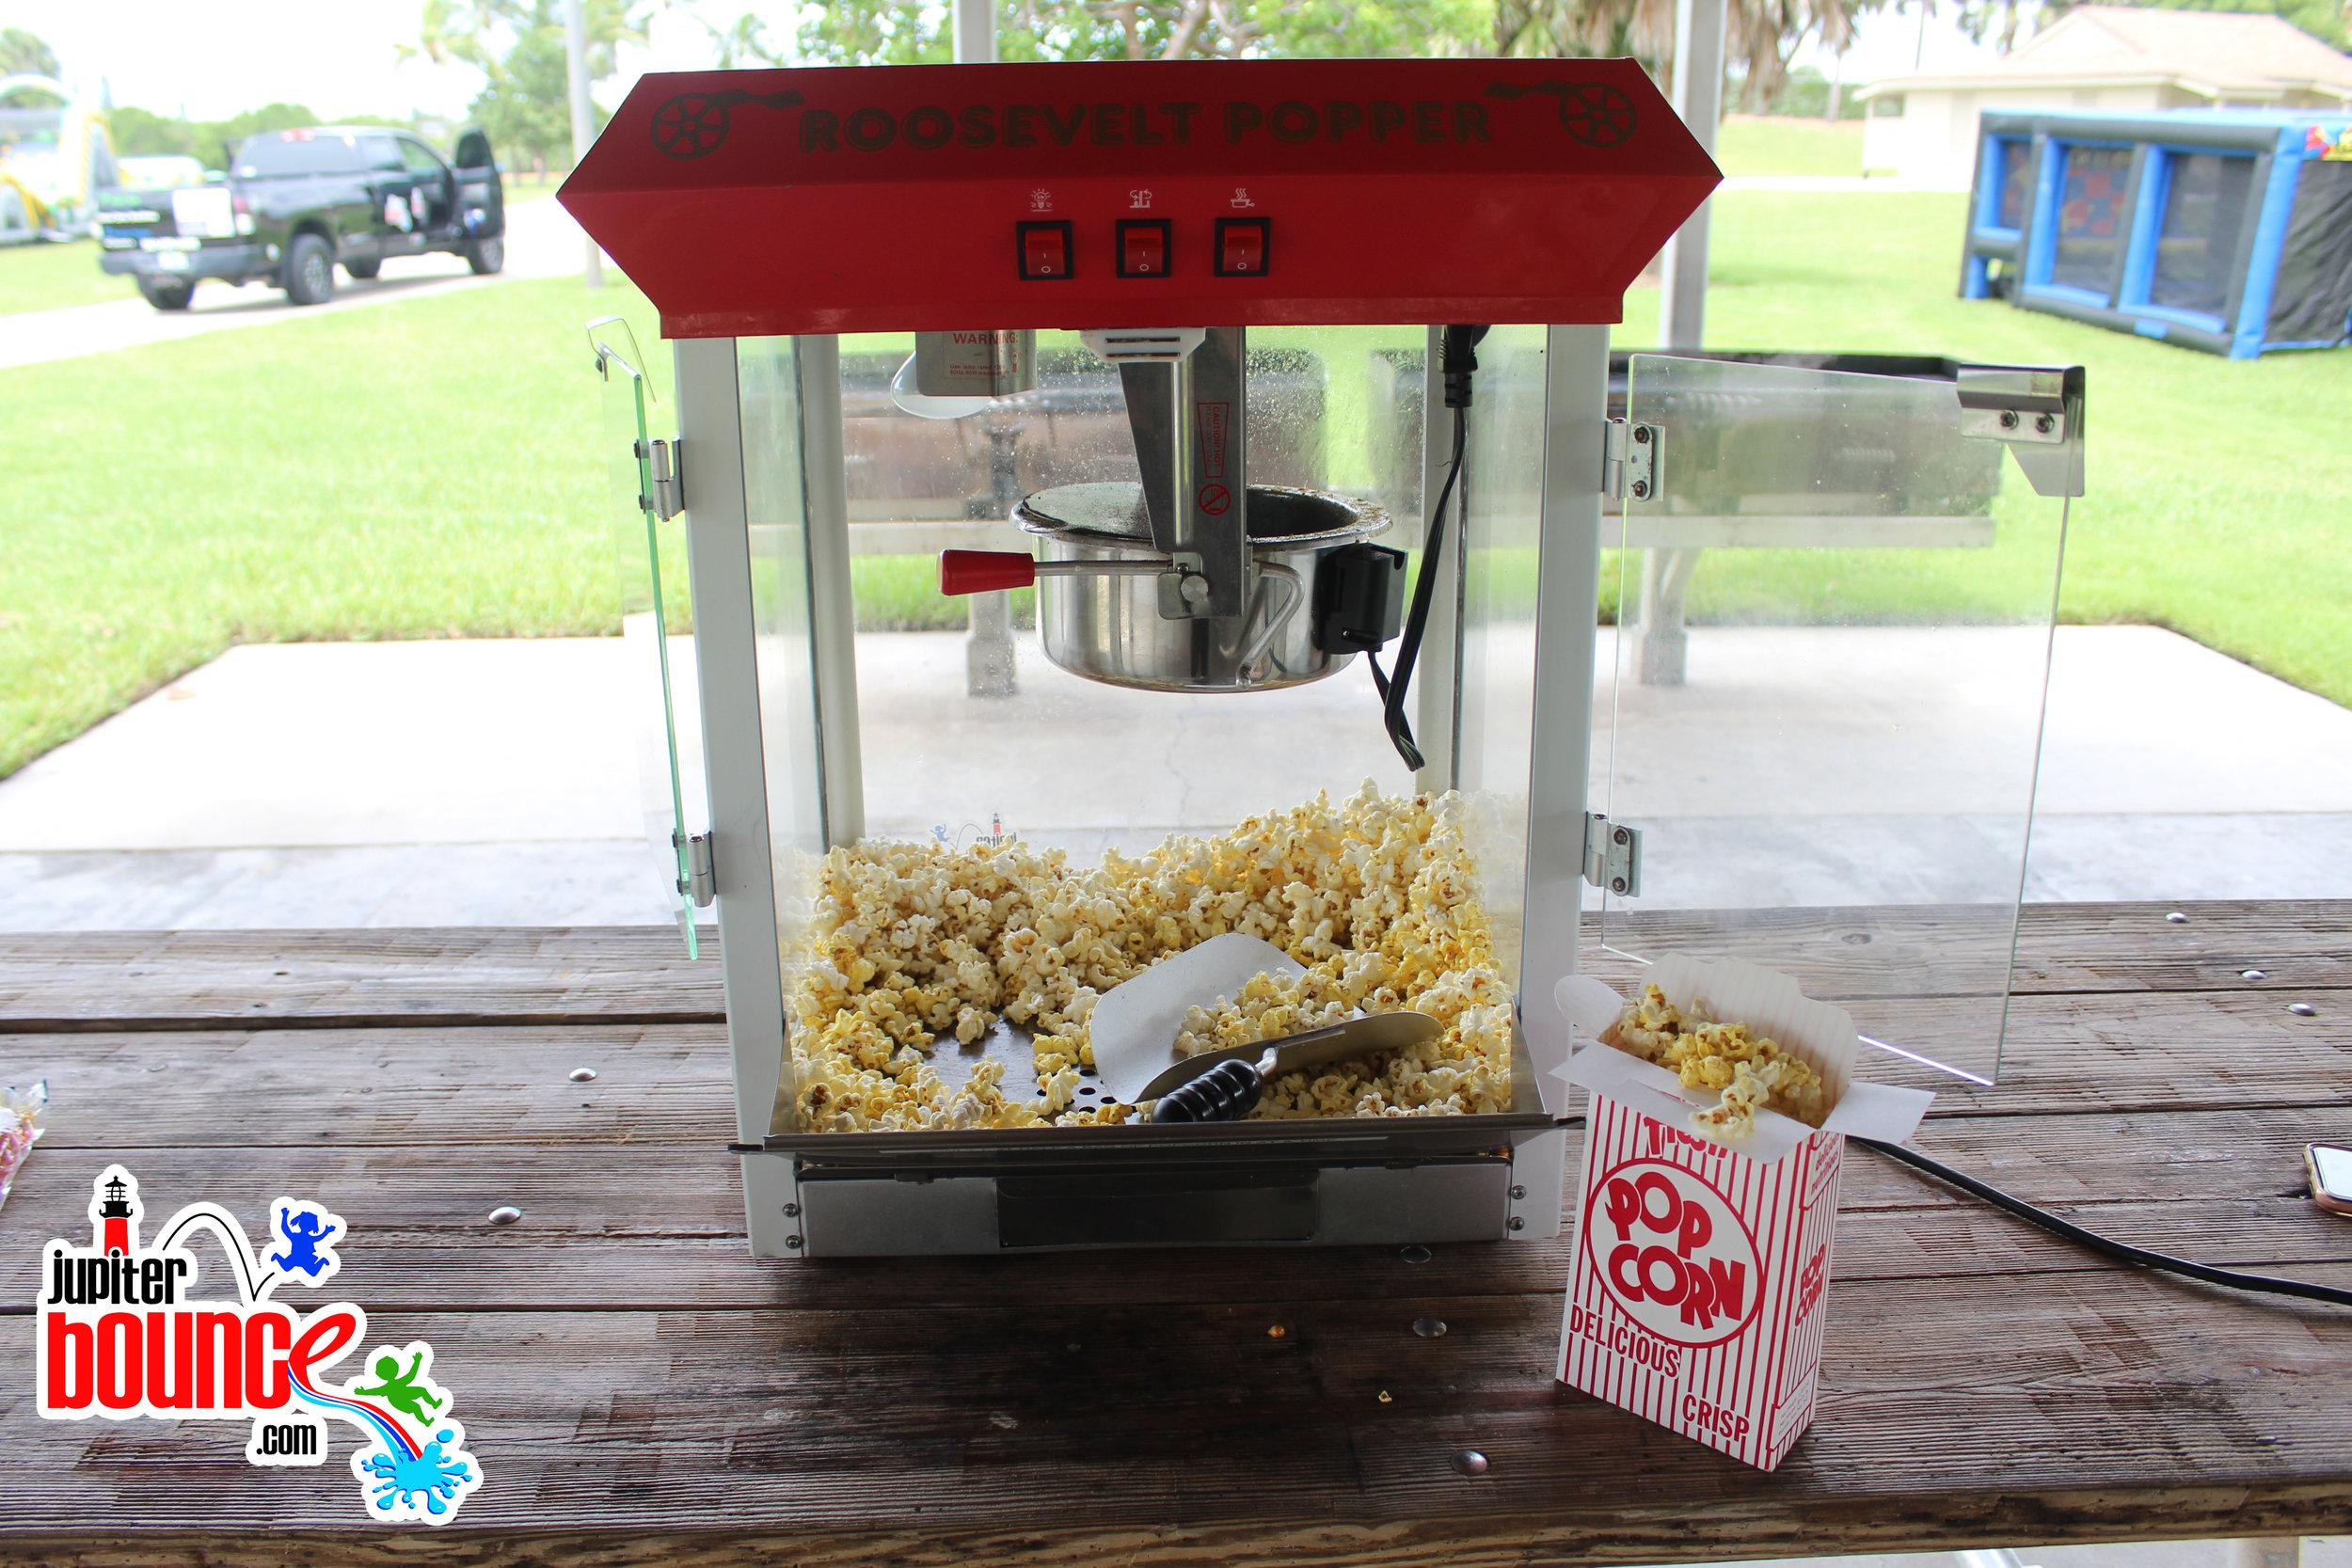 popcornmachine-jupiterbounce-westpalmbeach-partyrentalpros-mybouncehouseguy-juplovin-indiantown-stuart-facepainter-33458.jpg